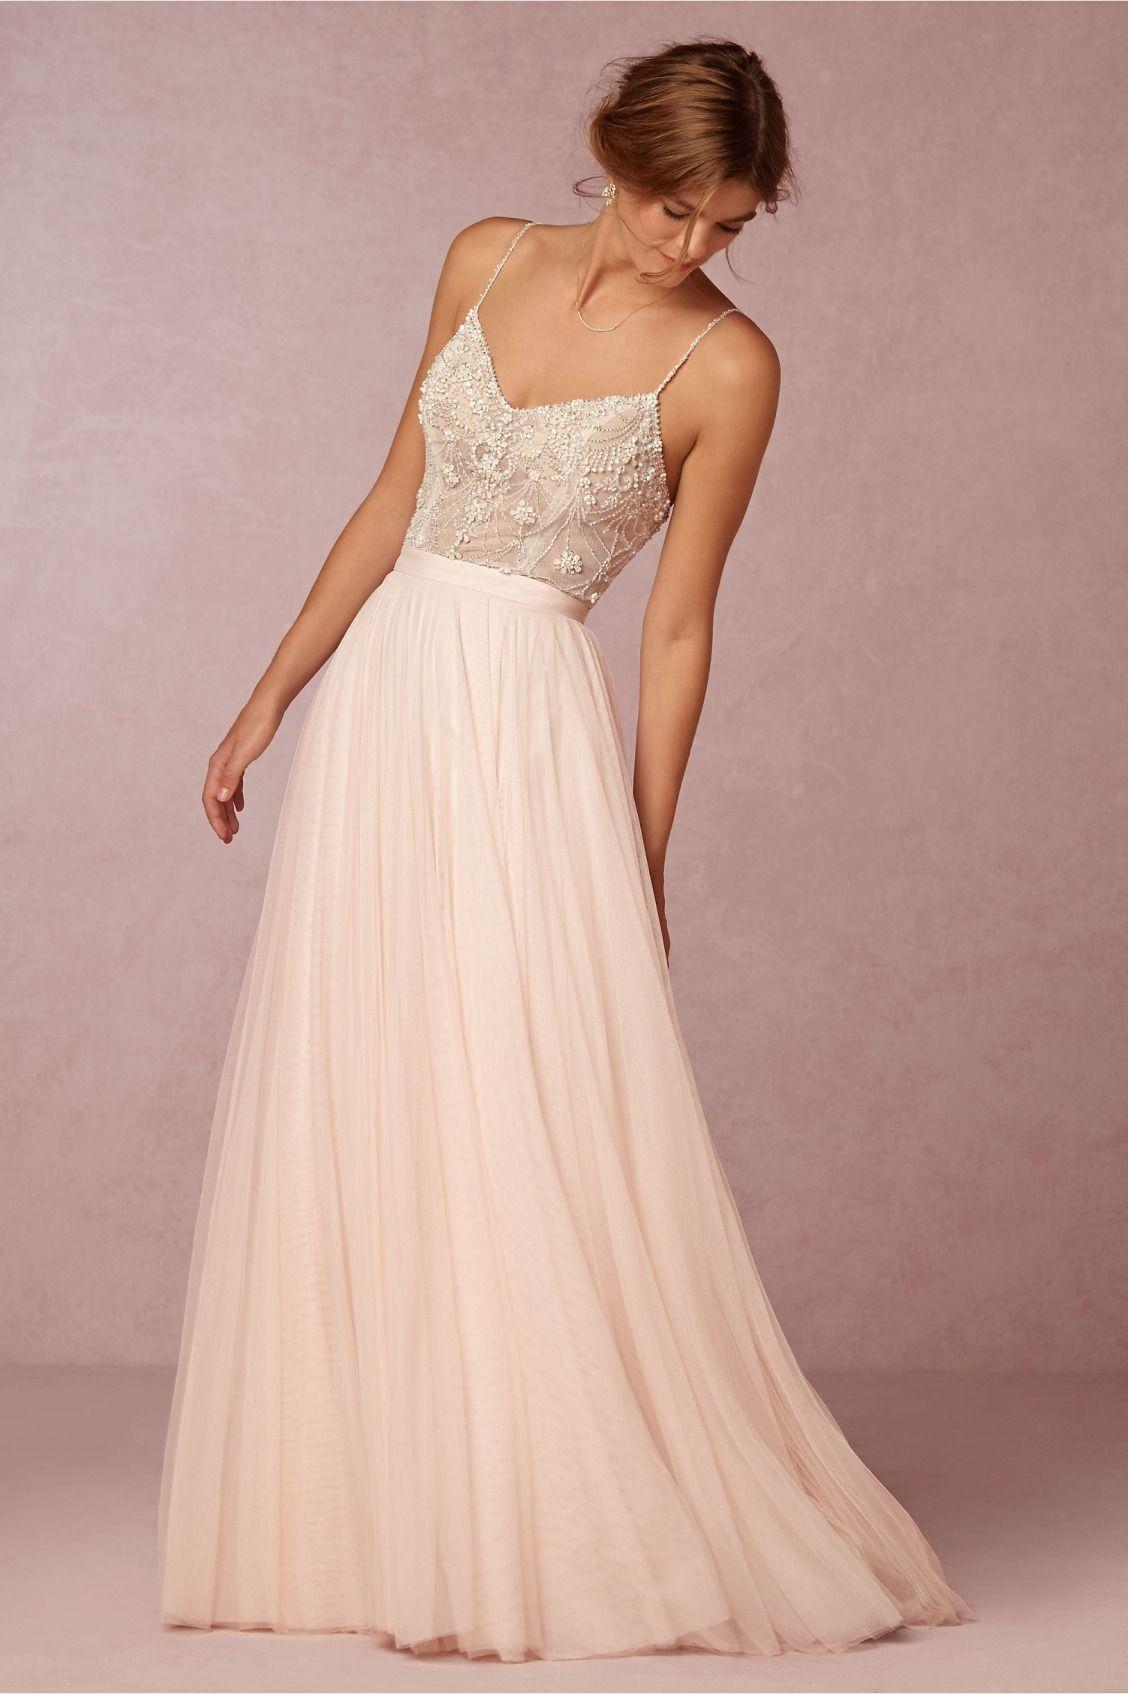 bridal separates | Ella Bodysuit & Amora Skirt in Porcelain from ...